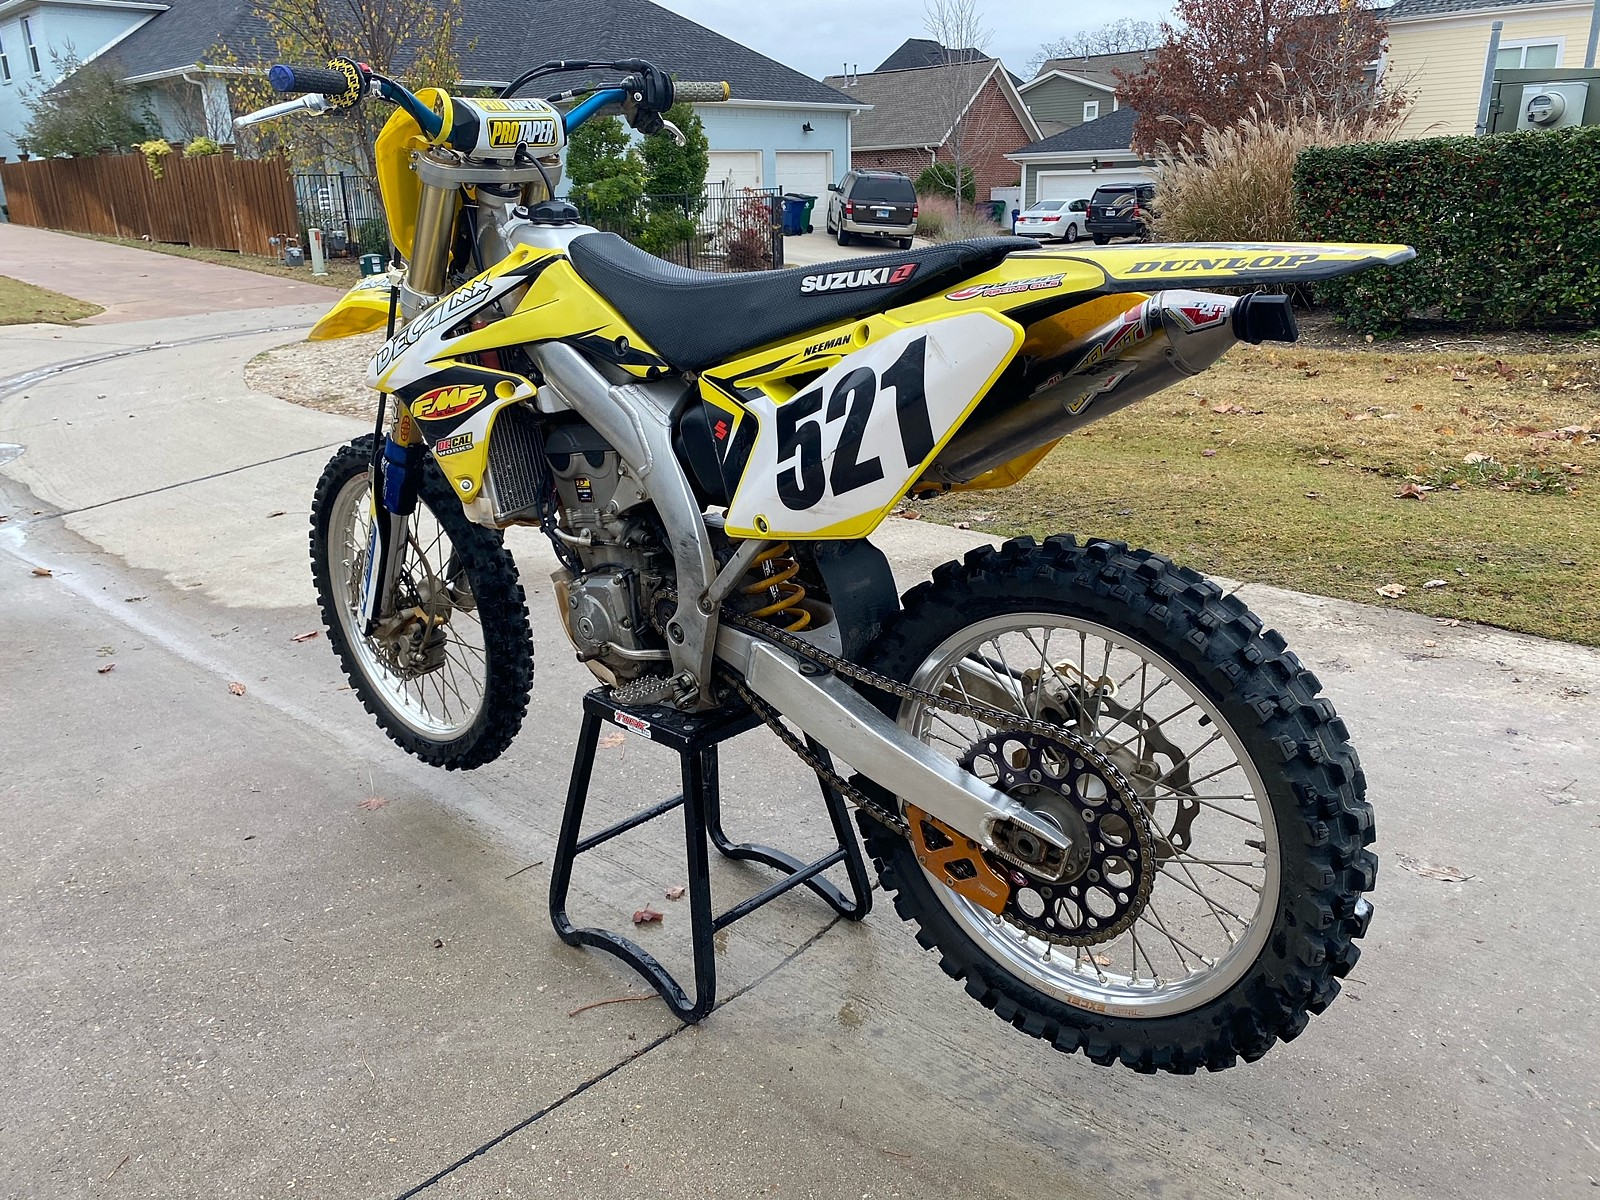 2011 RMZ450 - hunterp27 - Motocross Pictures - Vital MX